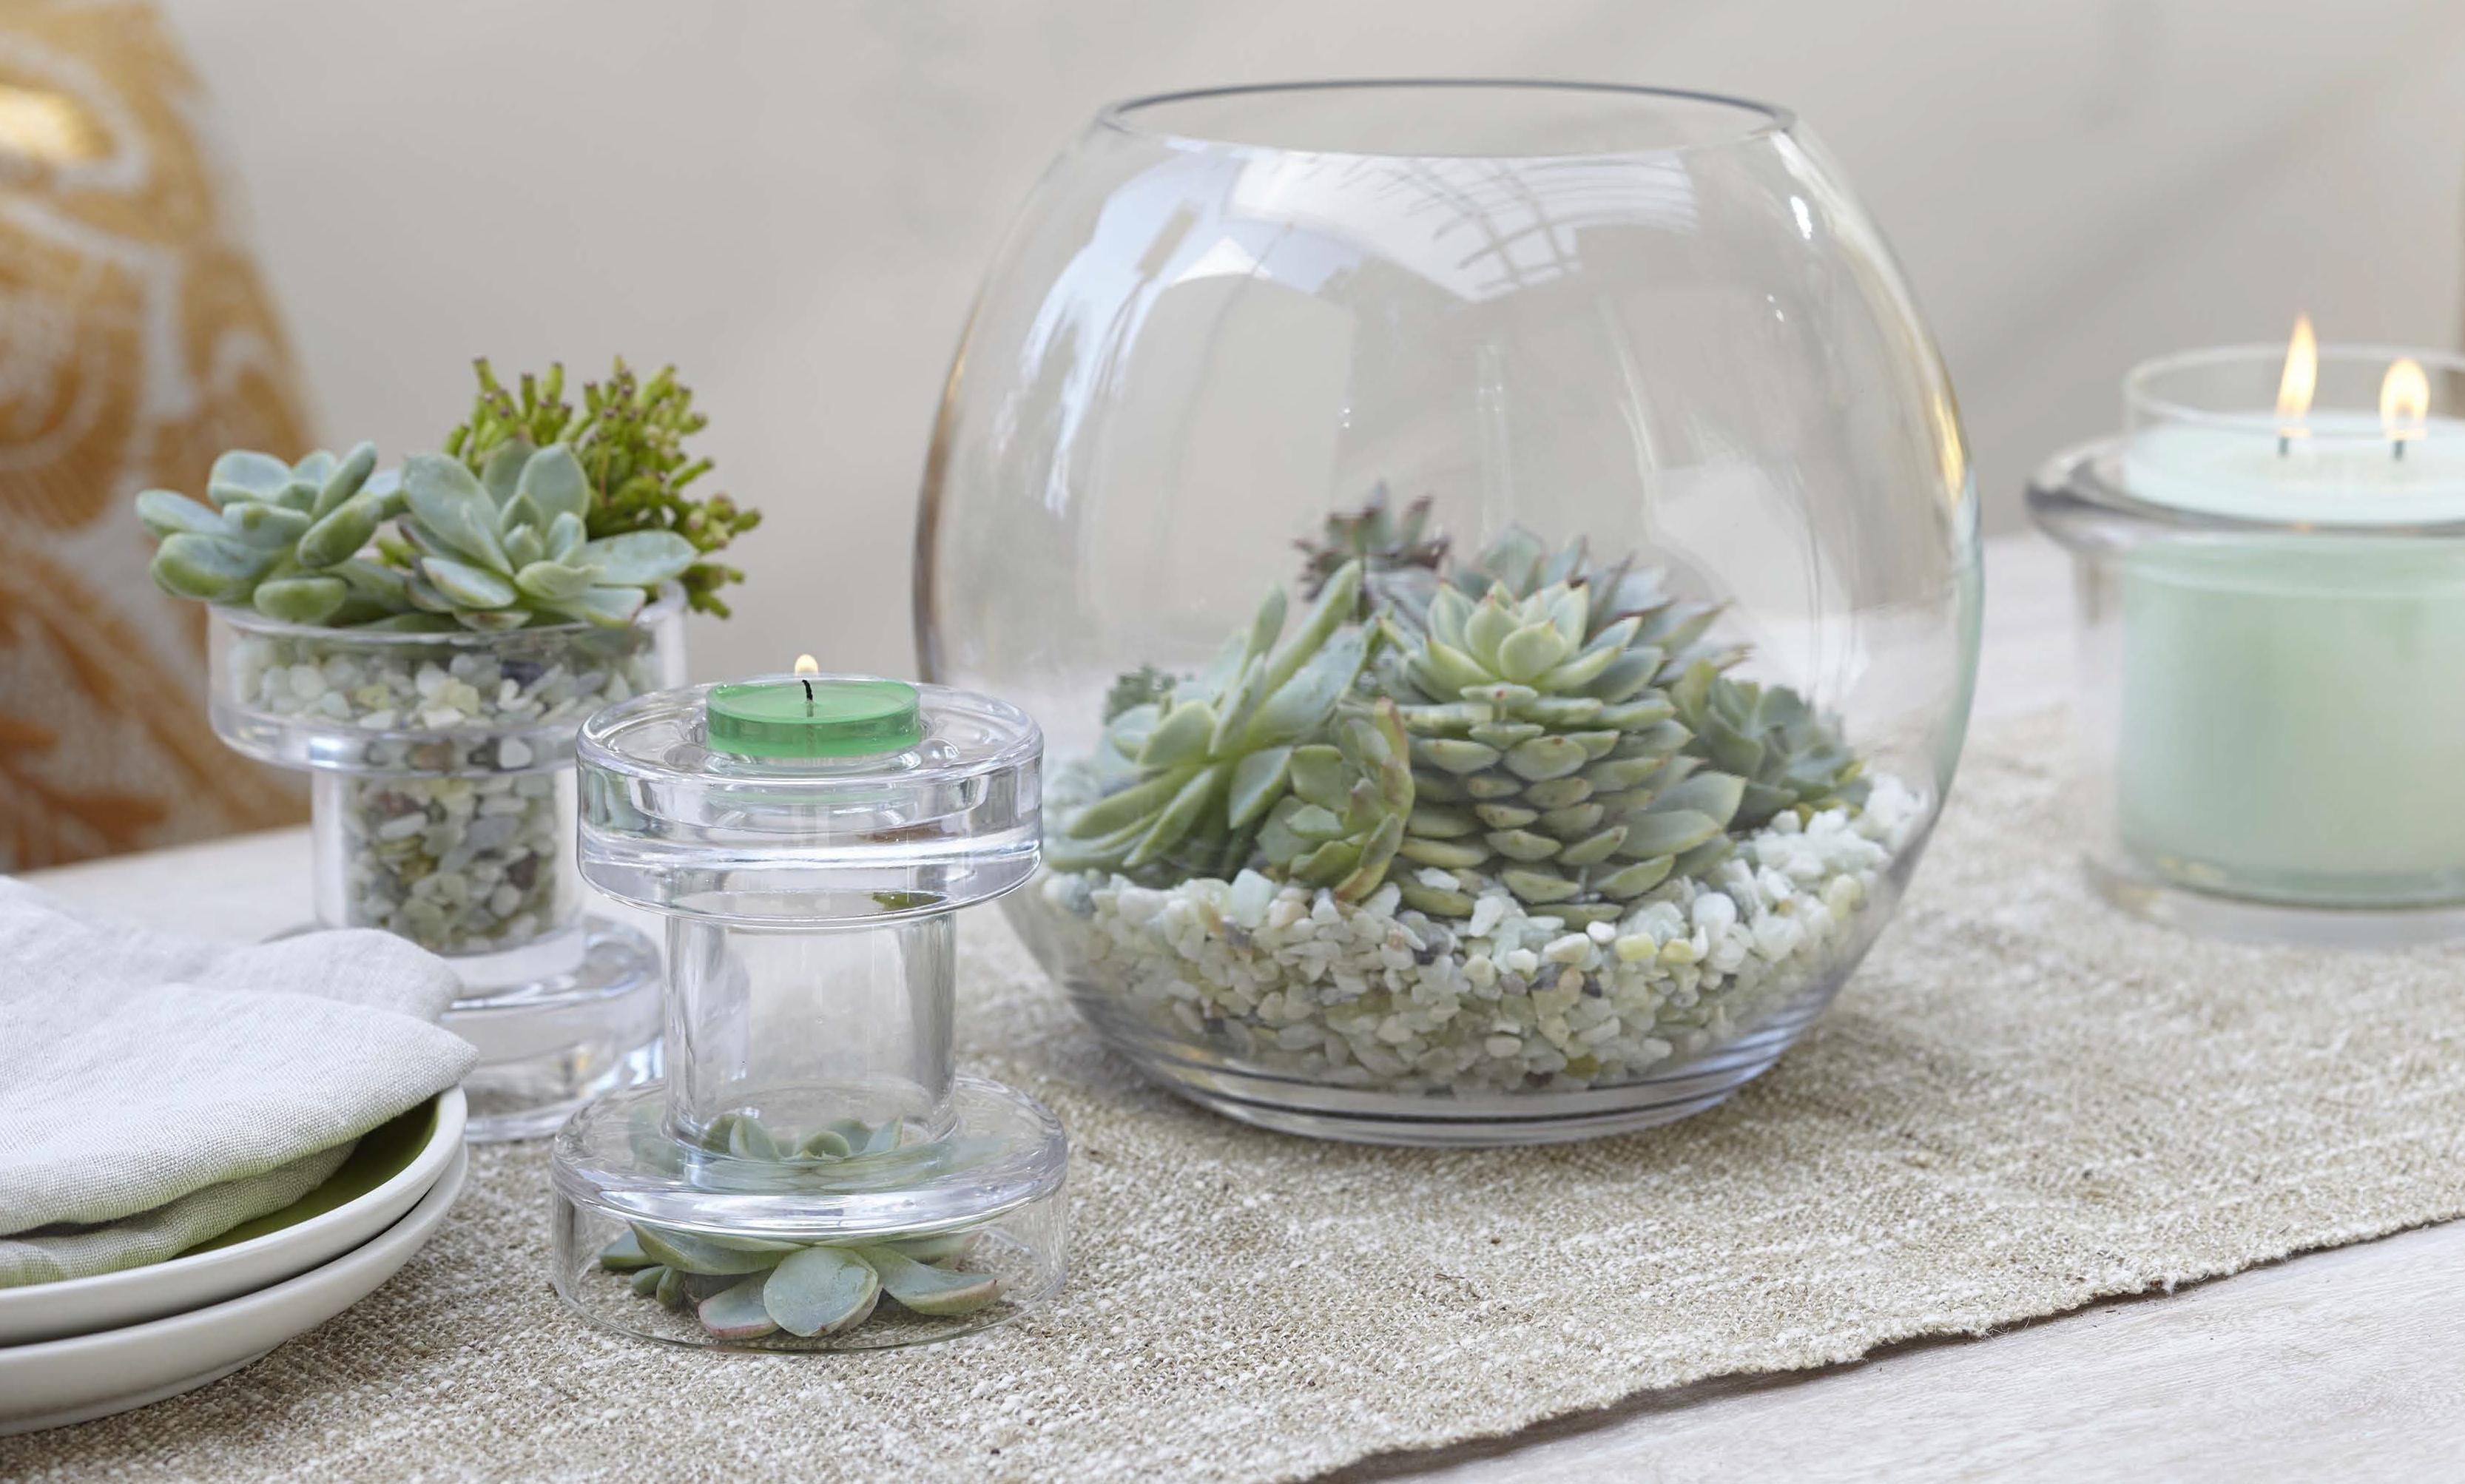 Idea For Large Glass Bowl Centerpiece Glass Bowl Centerpieces Glass Bowl Decor Centerpiece Bowl Large glass decorative bowl